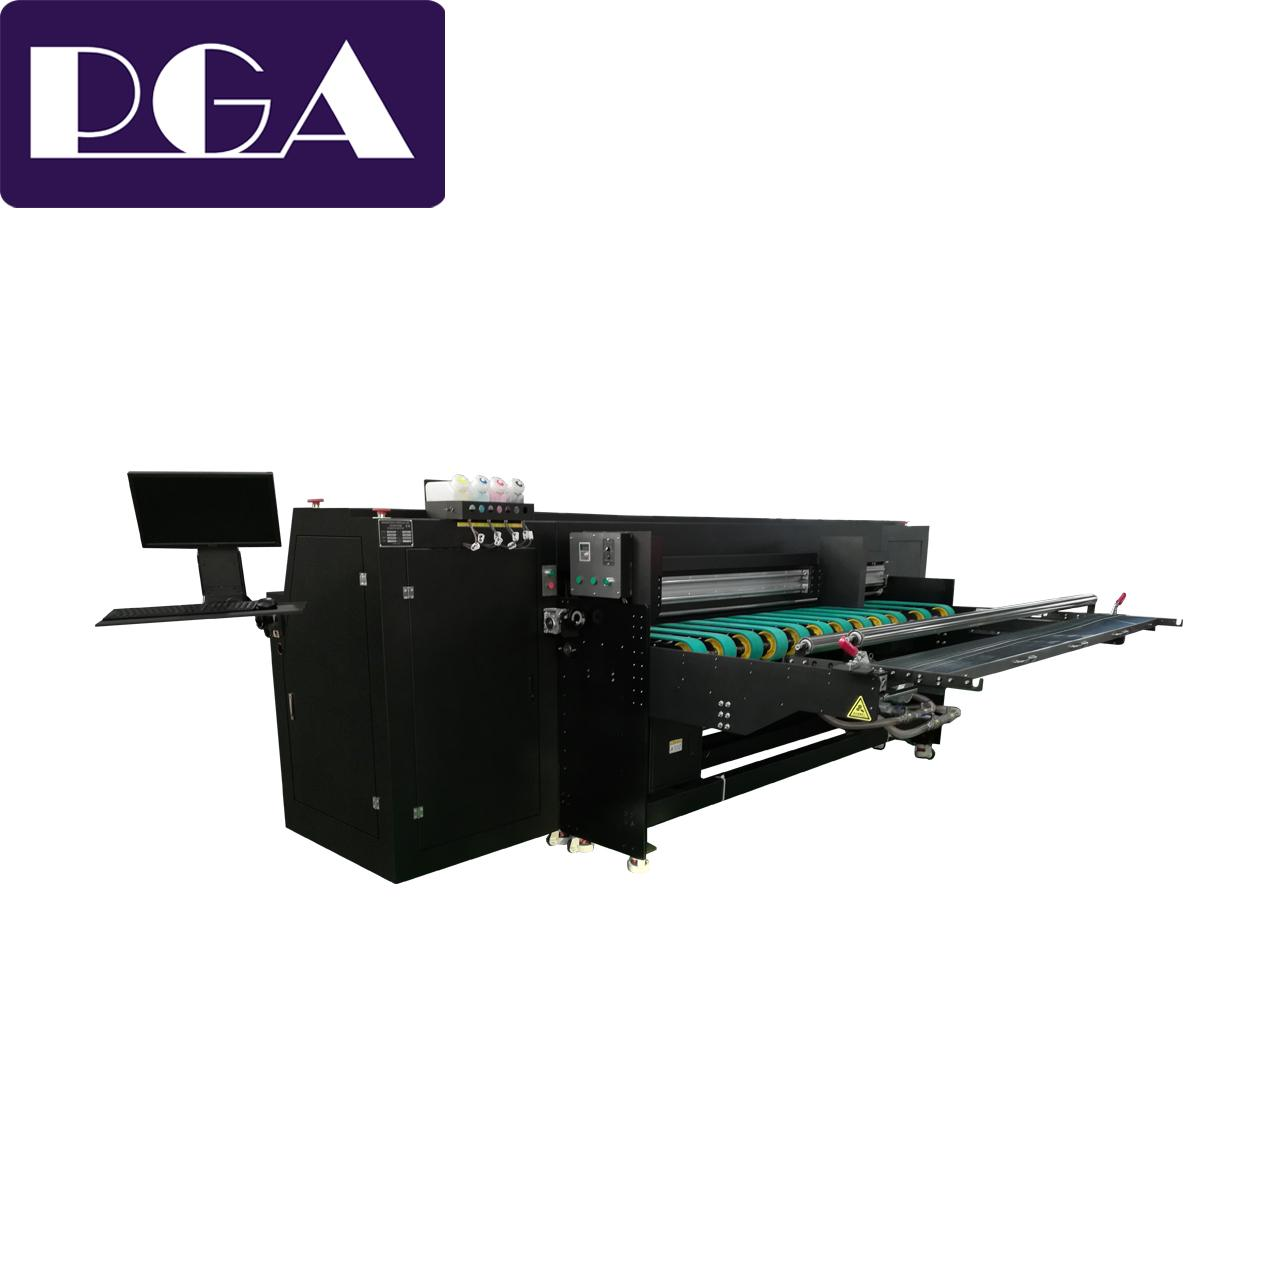 Corrugated box pizza box digital inkjet printer 2500AF-6PH 1